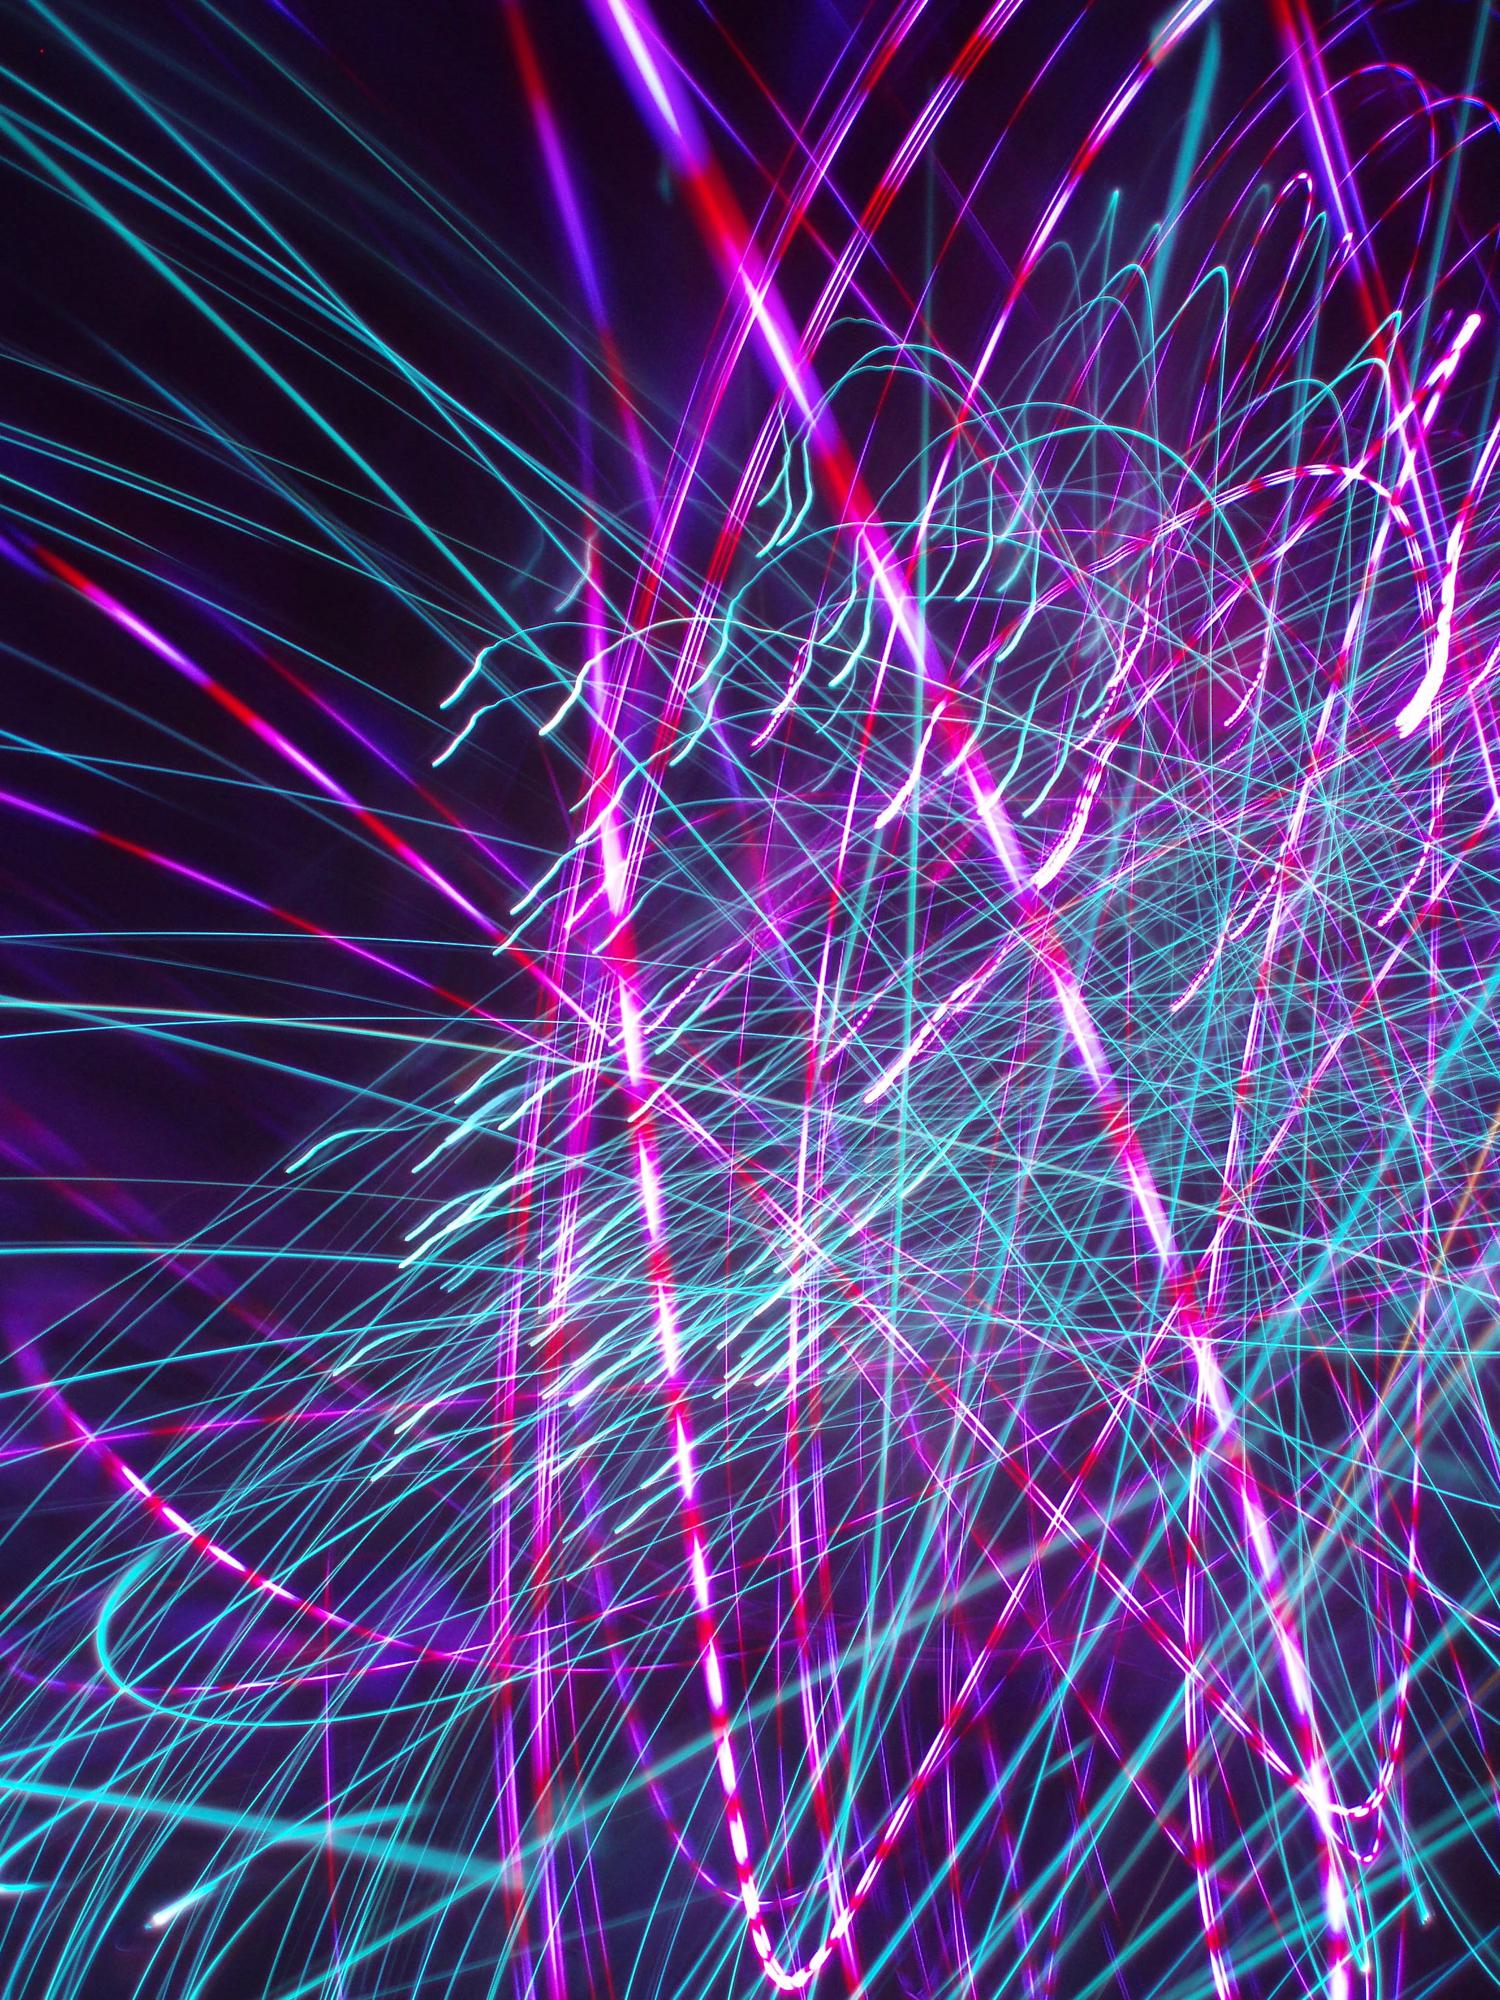 FOABS TRACTOS (untitled), digital photograph (un-enhanced), 2004